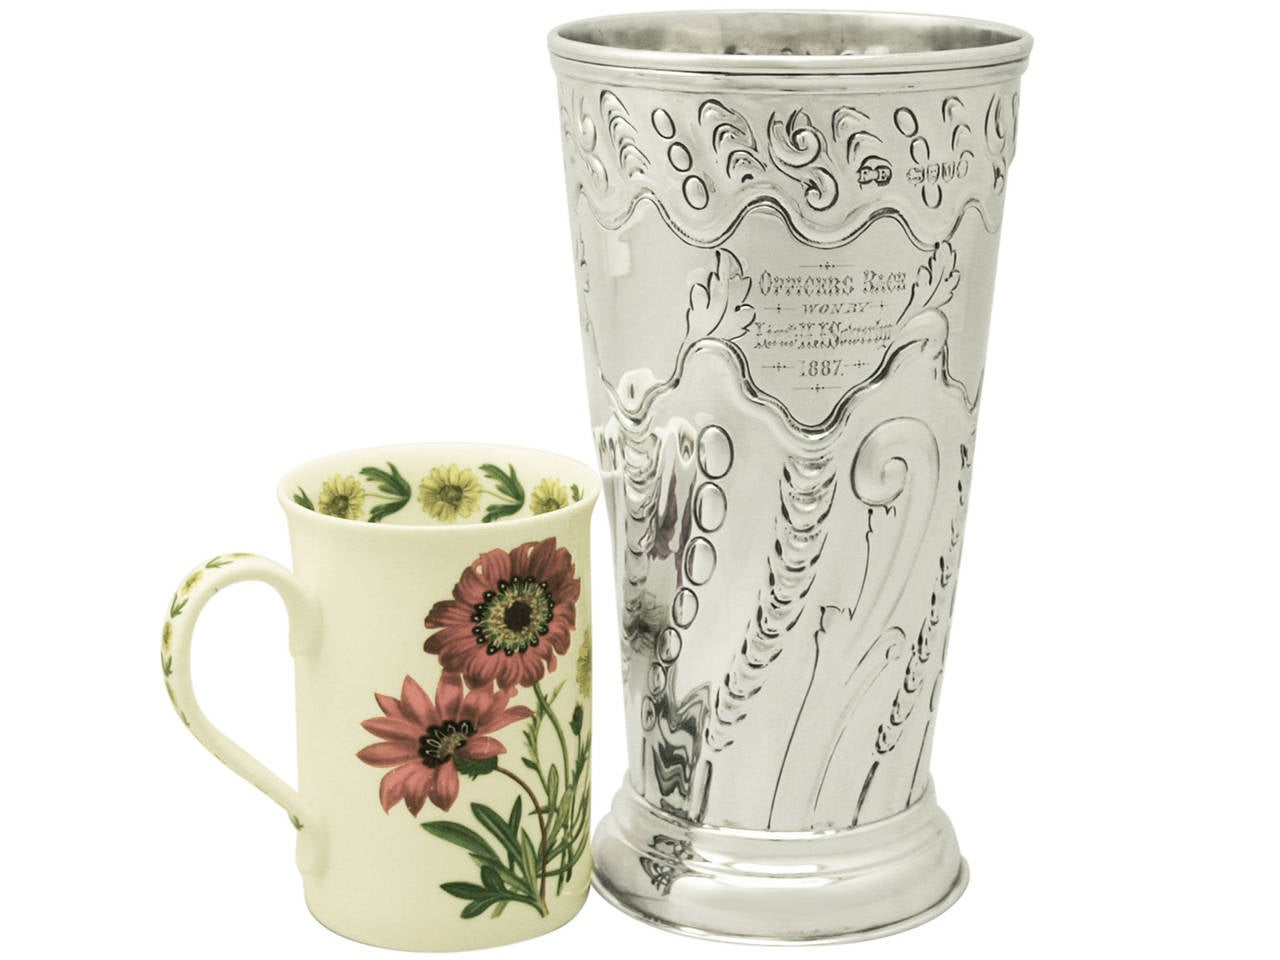 sterling silver vase antique victorian for sale at 1stdibs